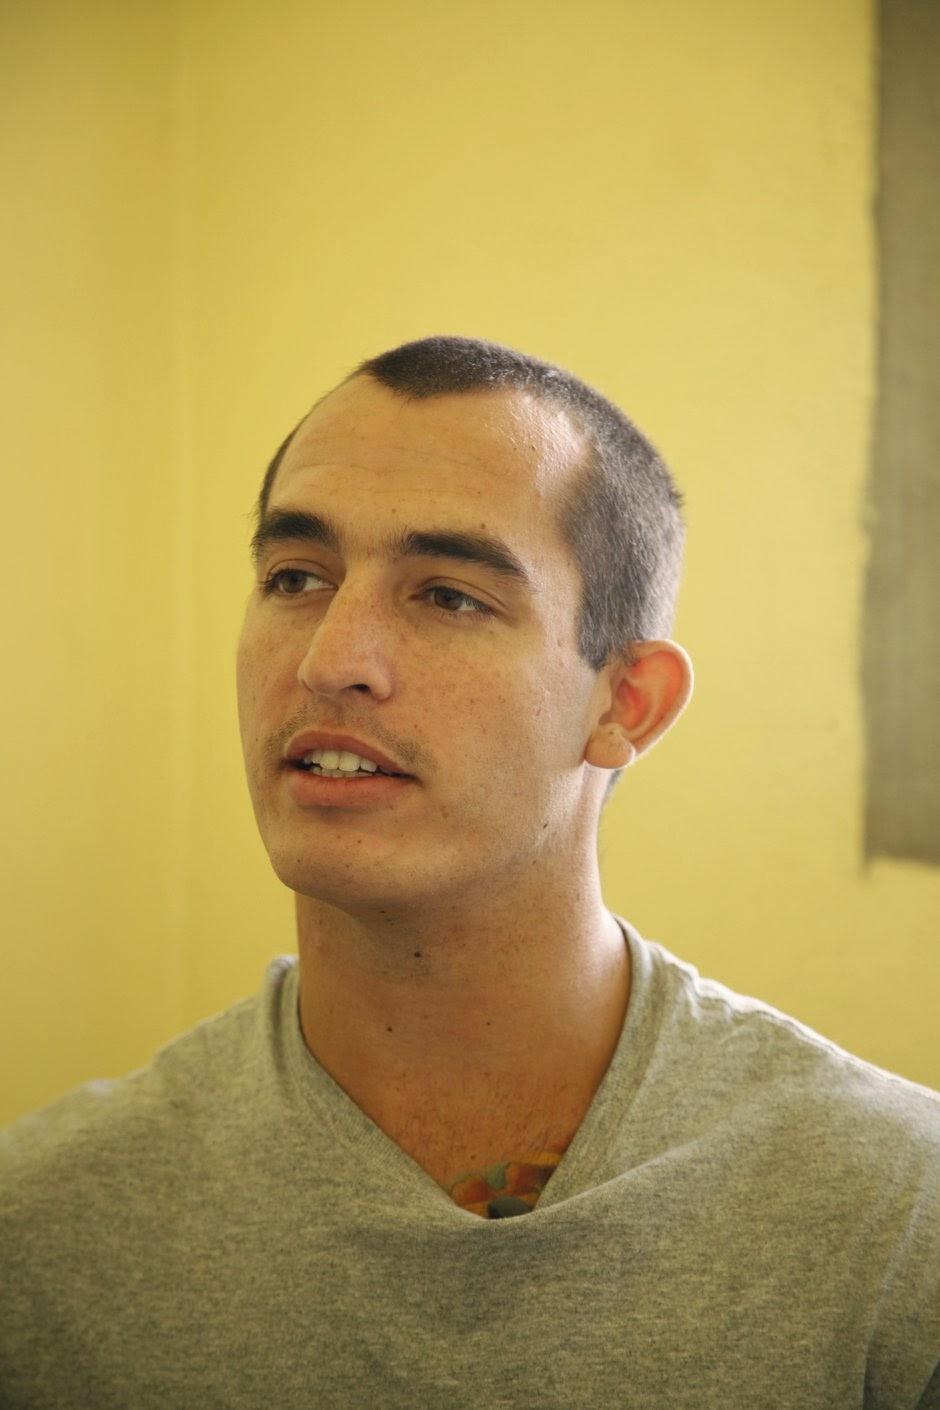 U.S. Marine veteran Andrew Tahmooressi